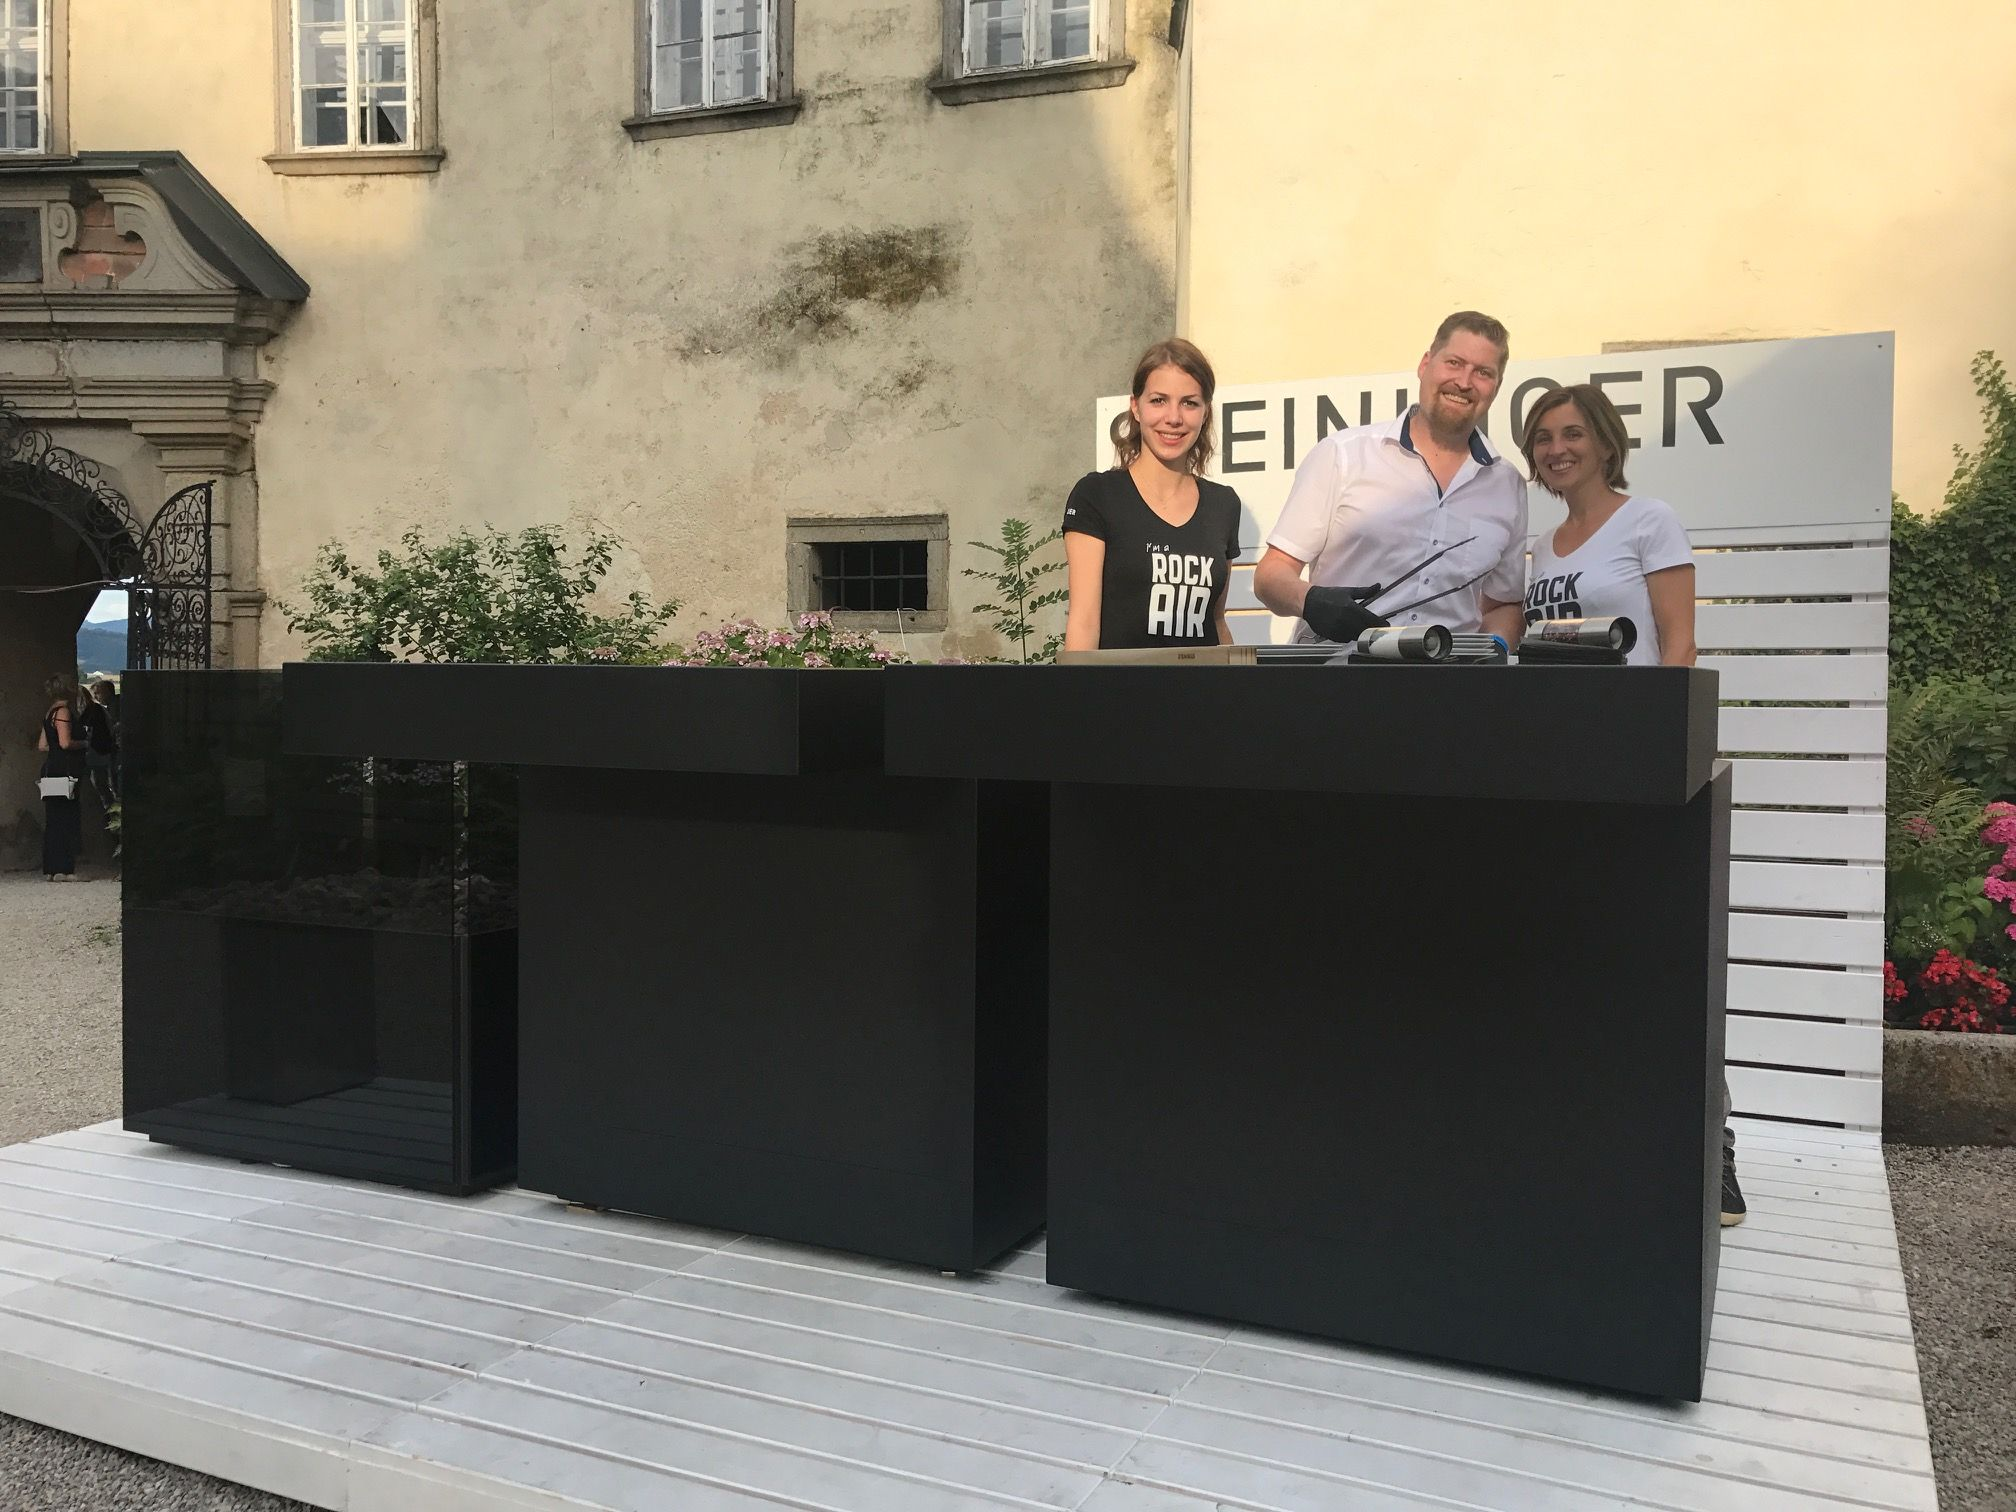 Steininger Outdoorküche : Steininger outdoorkitchen rockair burgclam clamlive concert